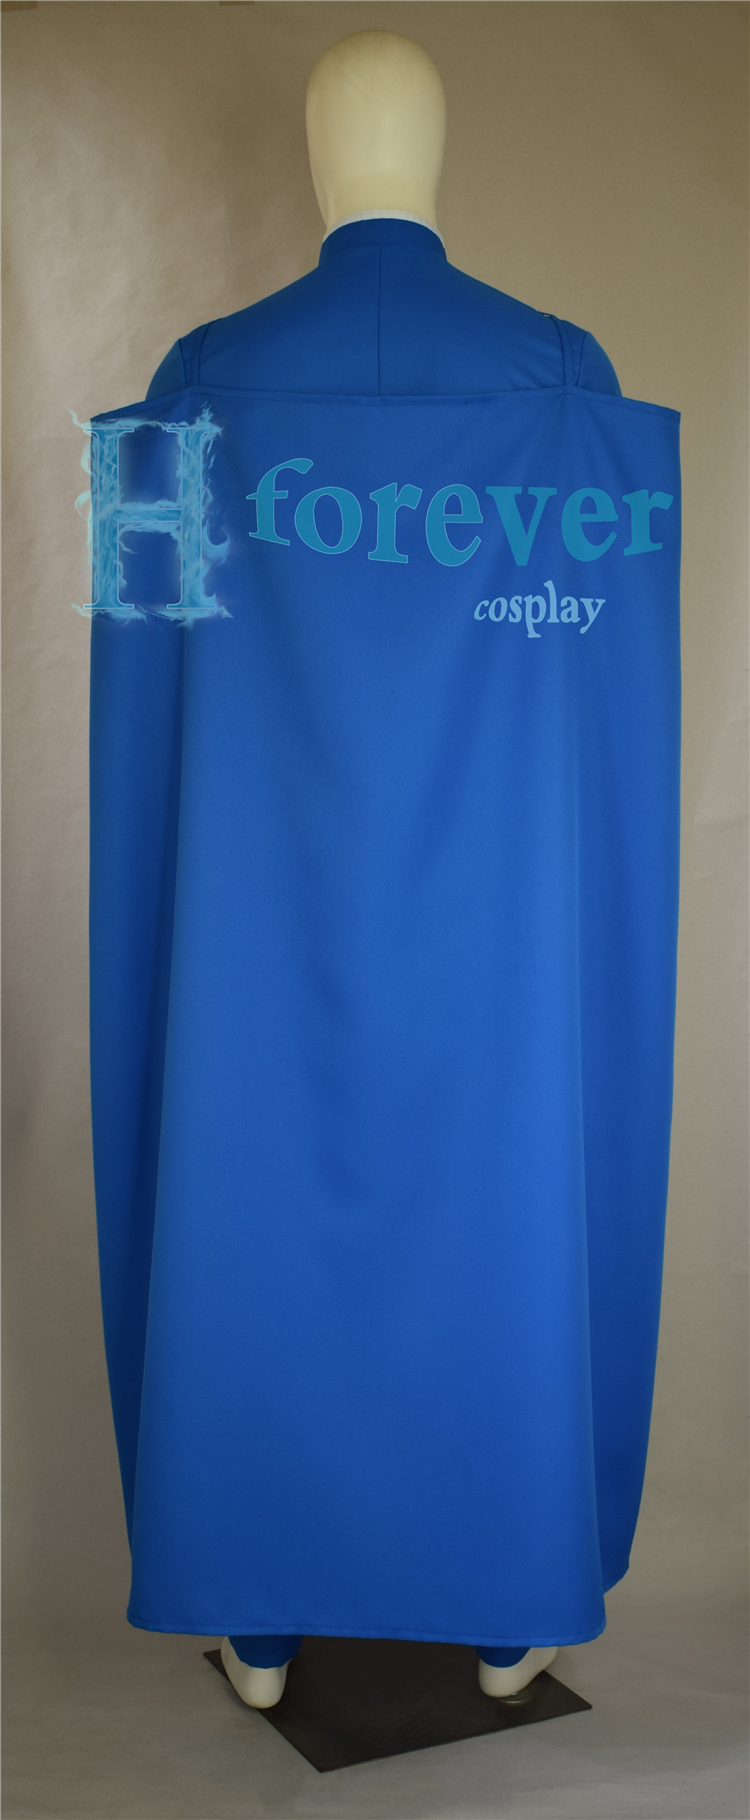 eugeo batalha uniforme cosplay traje unisex para